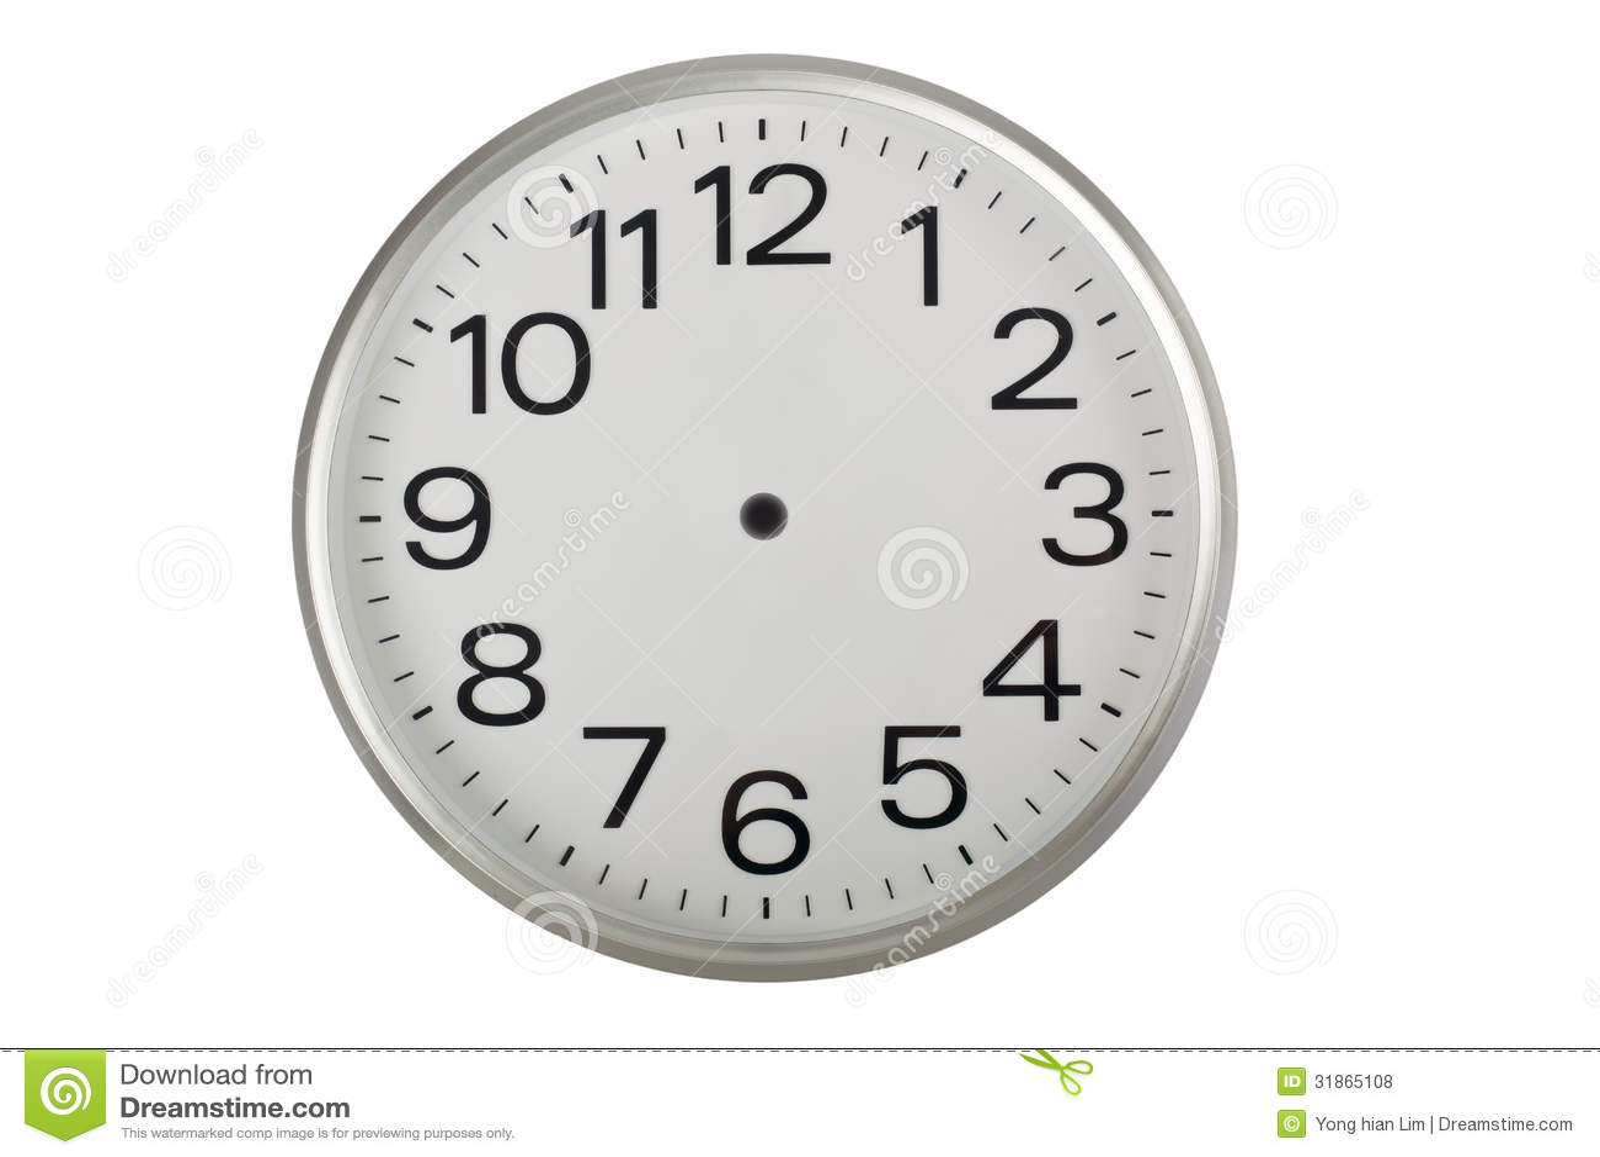 Handless Clock Royalty Free Stock Photos Image 31865108